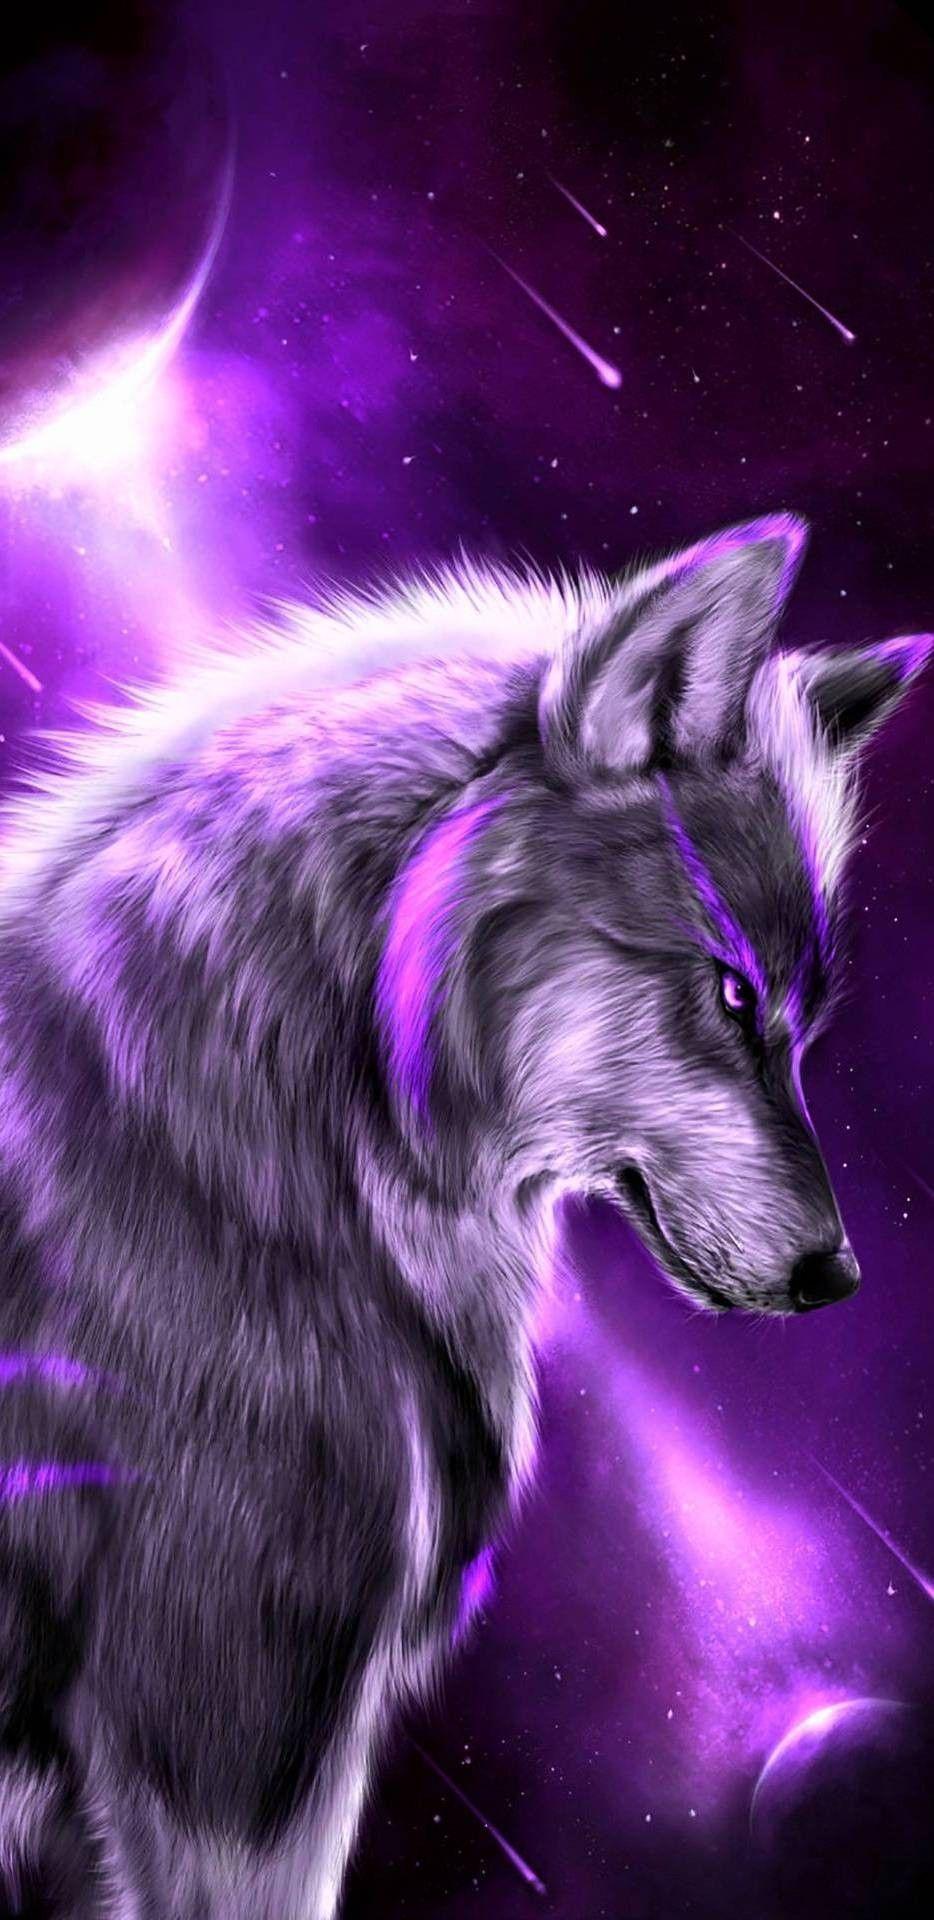 Cute Anime Wolf Wallpaper Nature Wolf Wallpaper Wolf Spirit Animal Fantasy Wolf